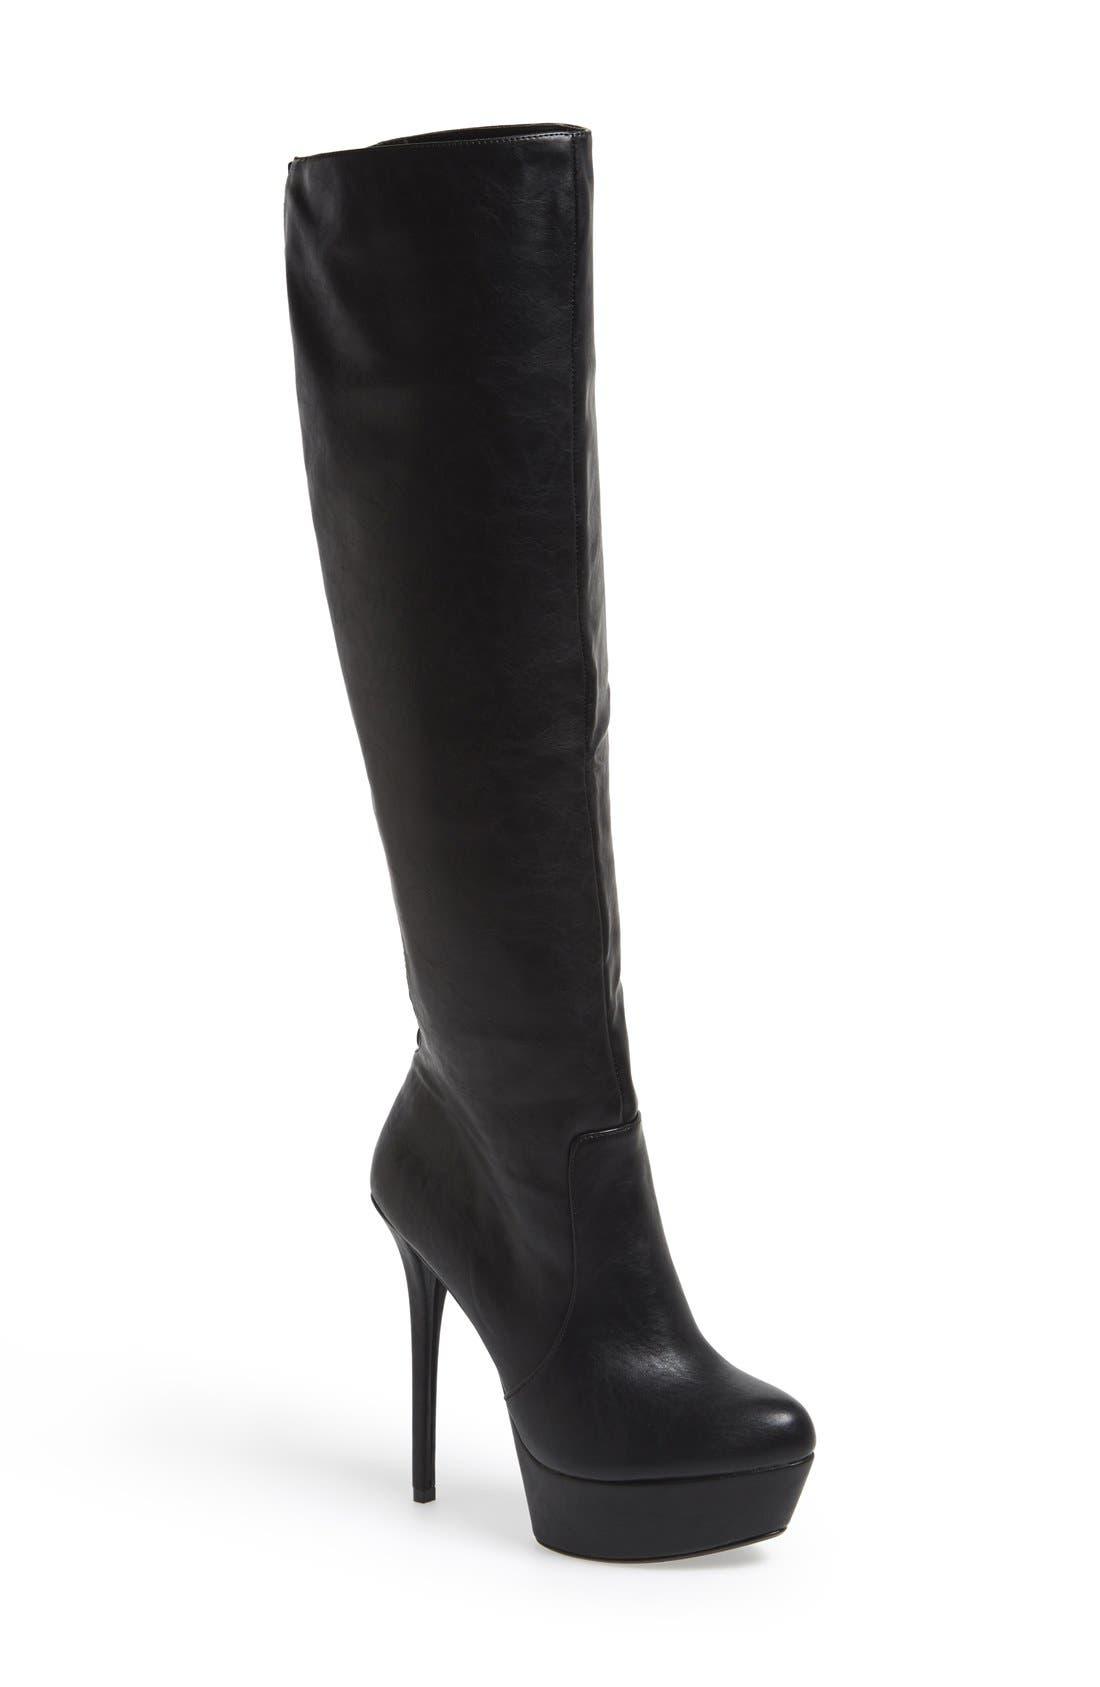 Main Image - Steve Madden 'Animall' Platform Boot (Women)